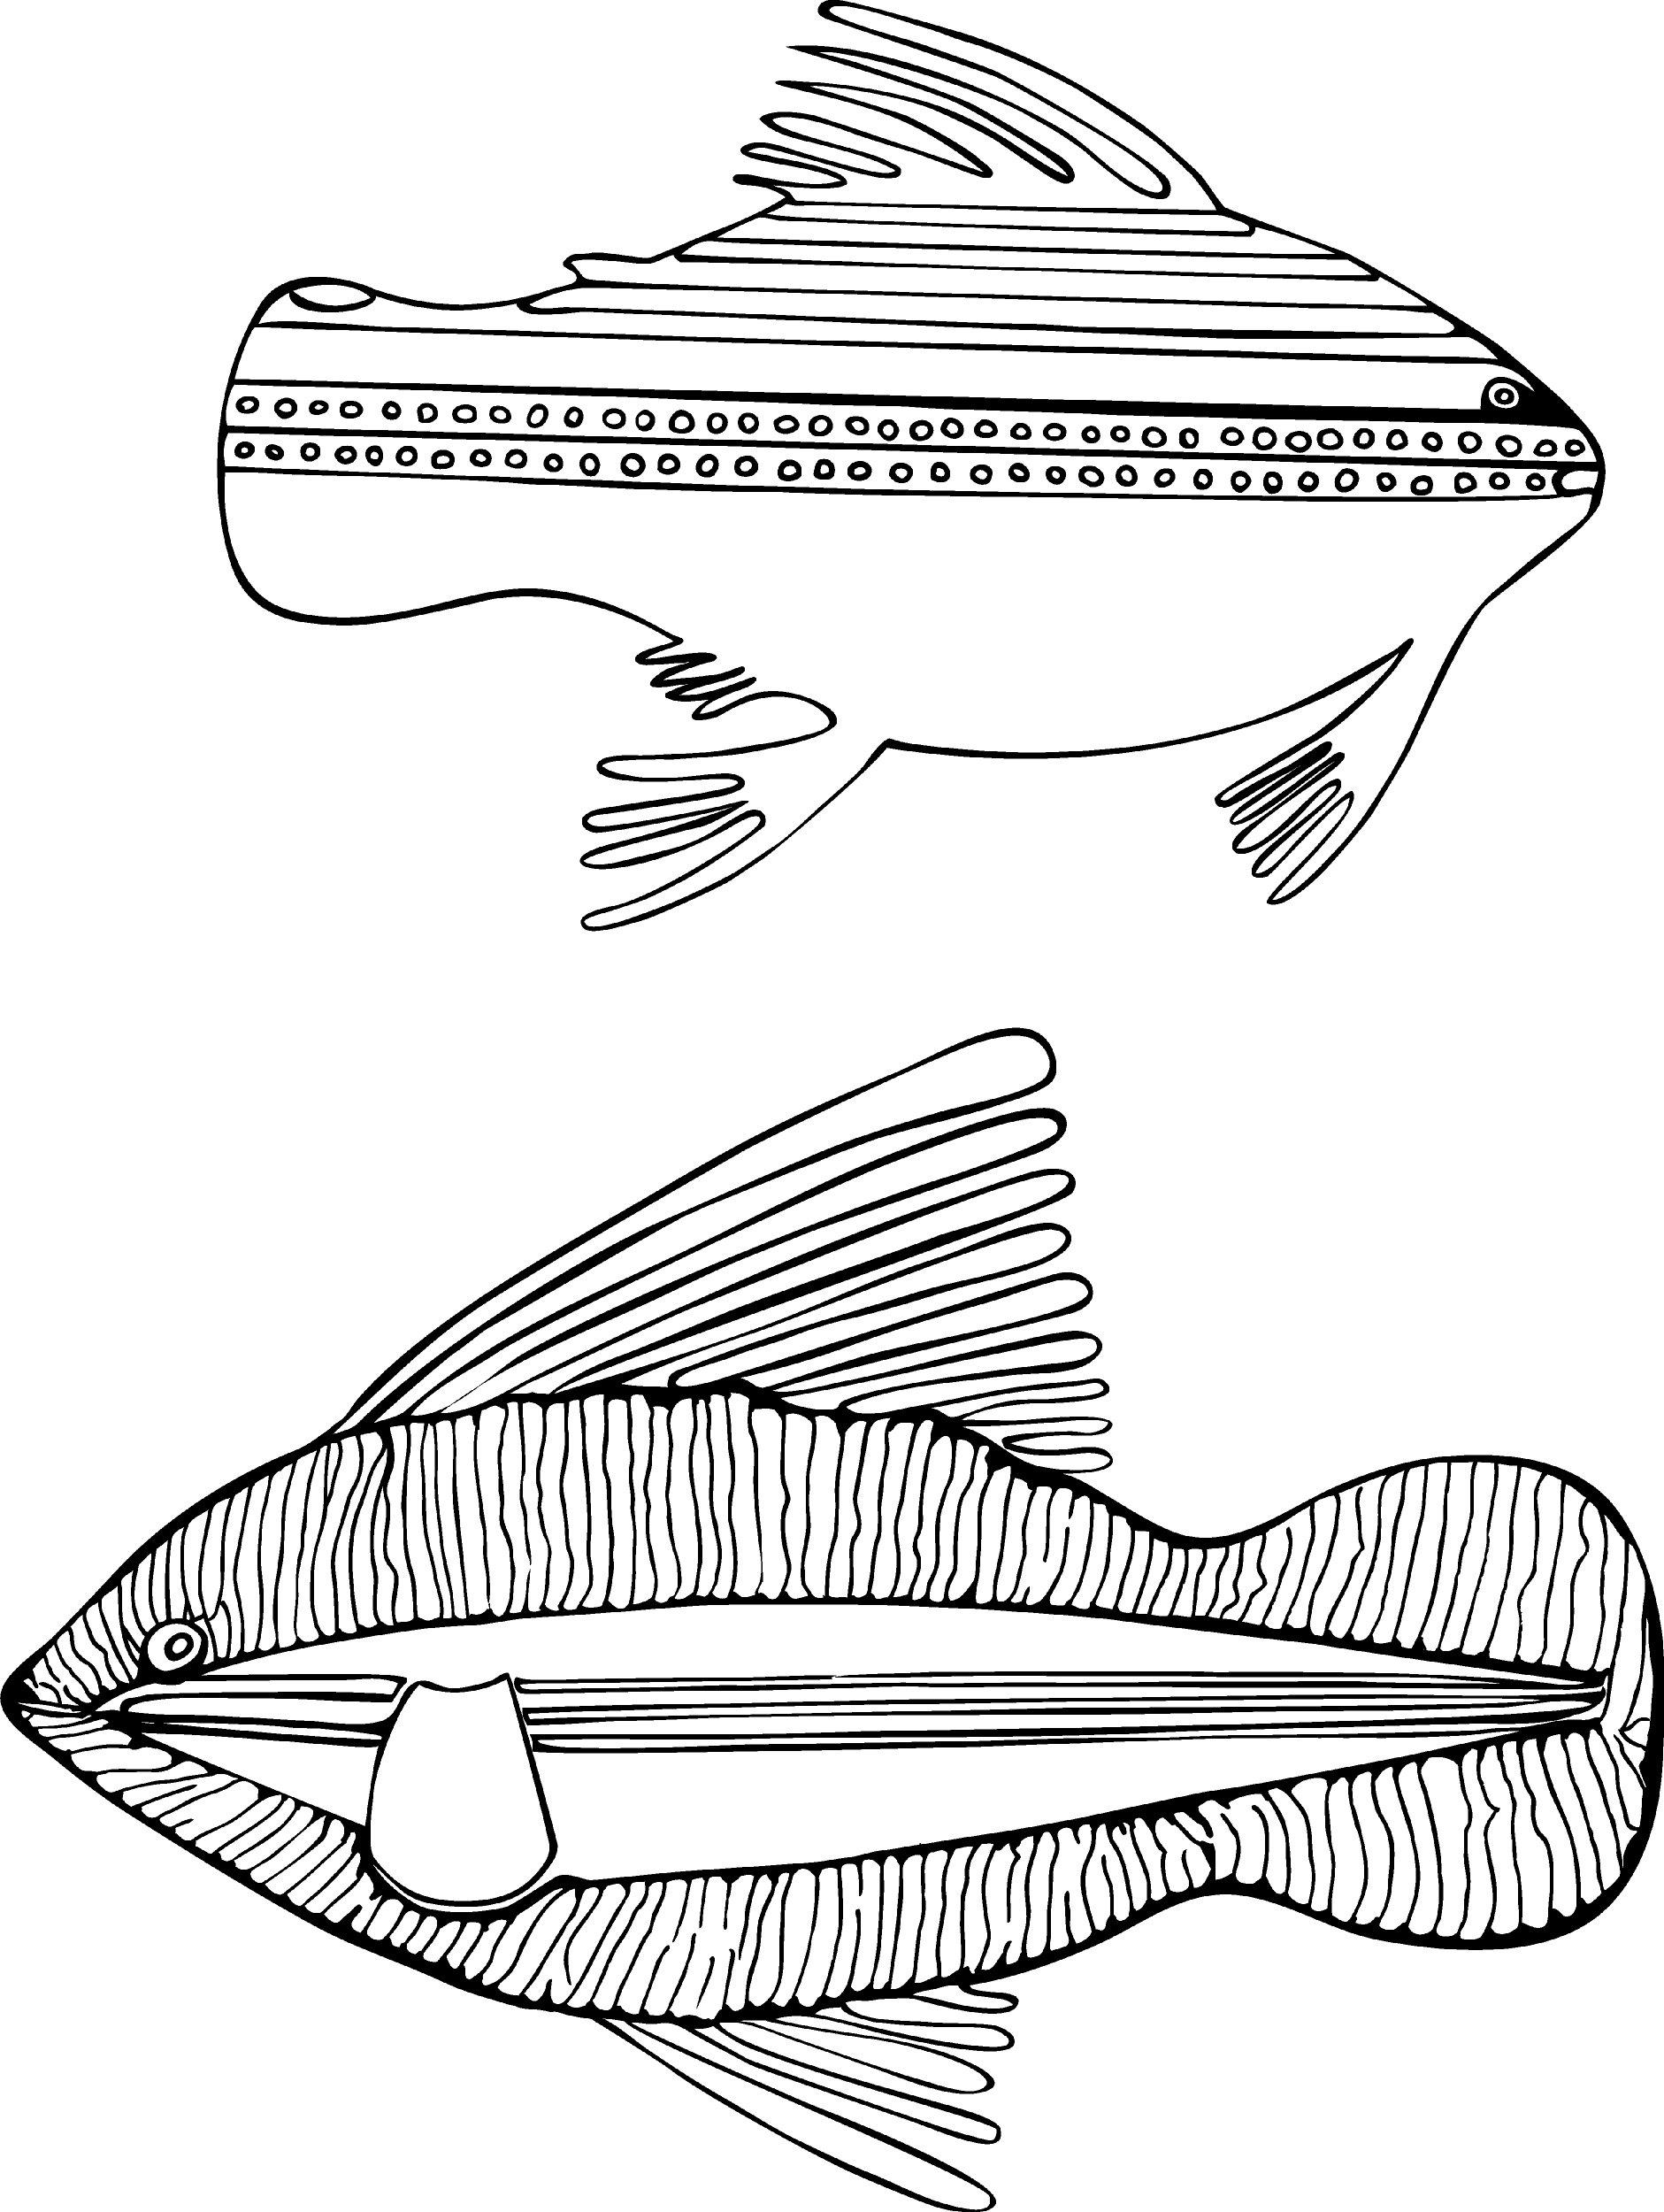 Inuit Art From Cape Dorset Coloring Book Pomegranate 9780764950223 Amazon Books